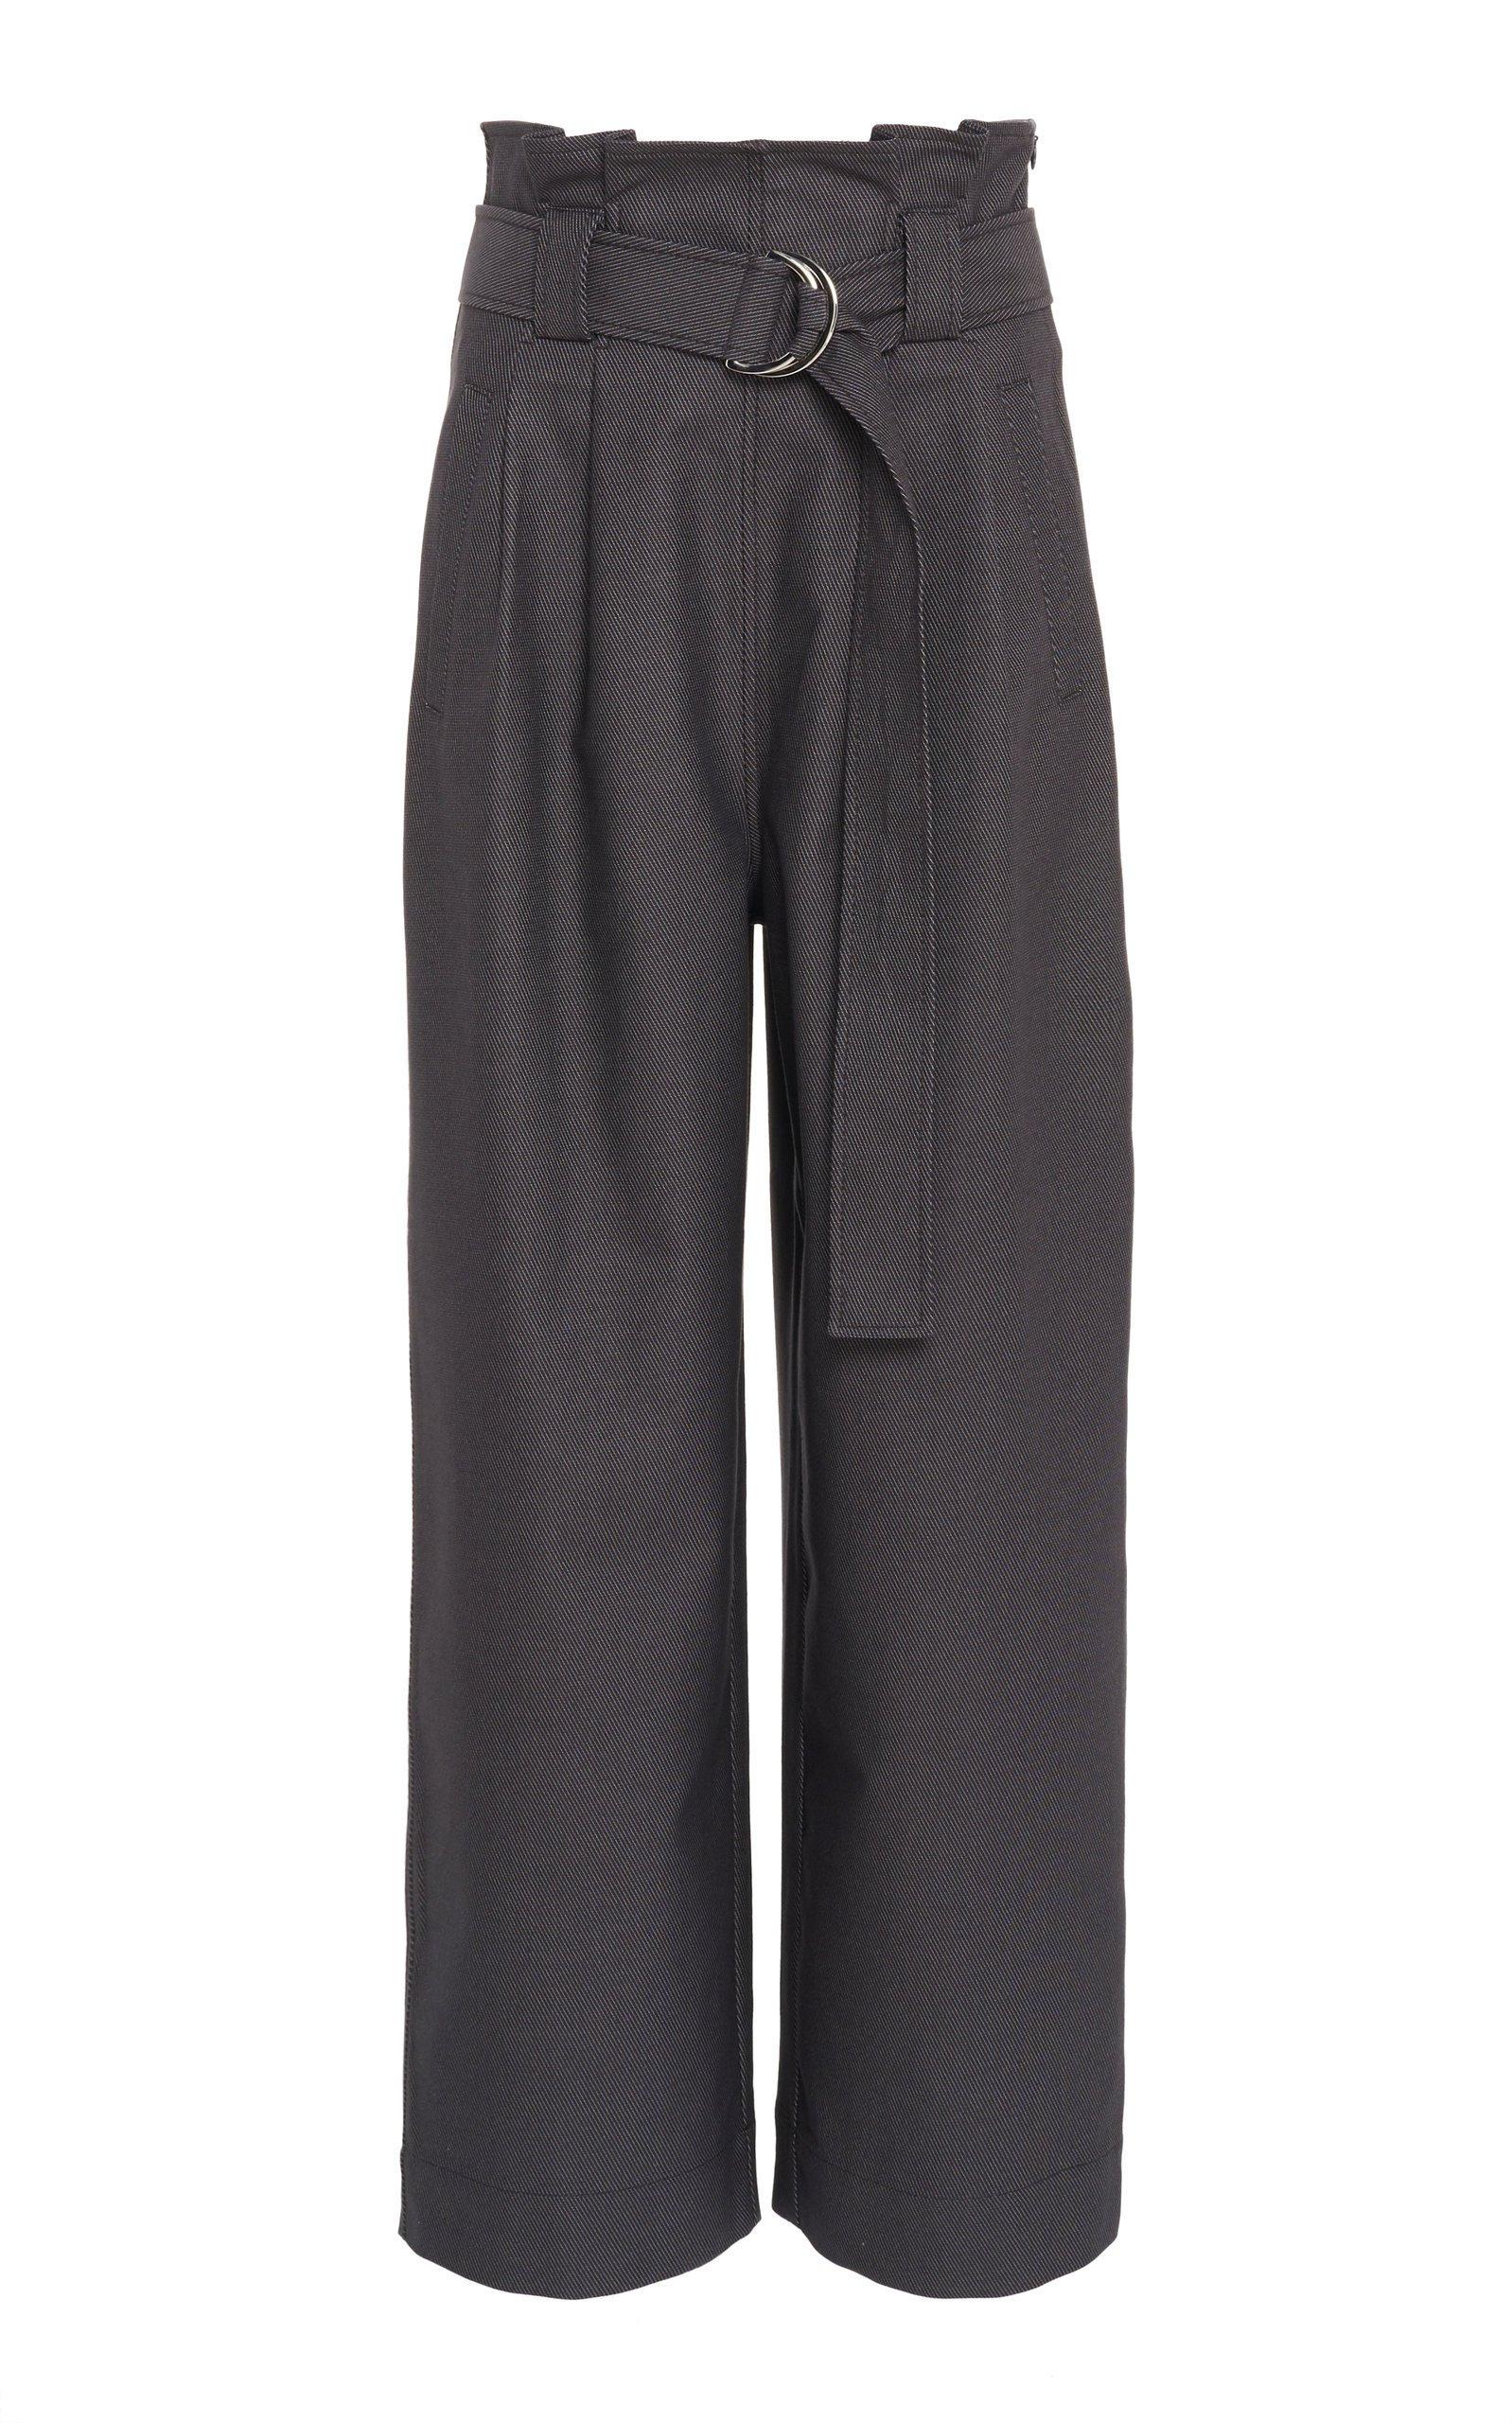 Ganni Belted Chino Wide-Leg Pants